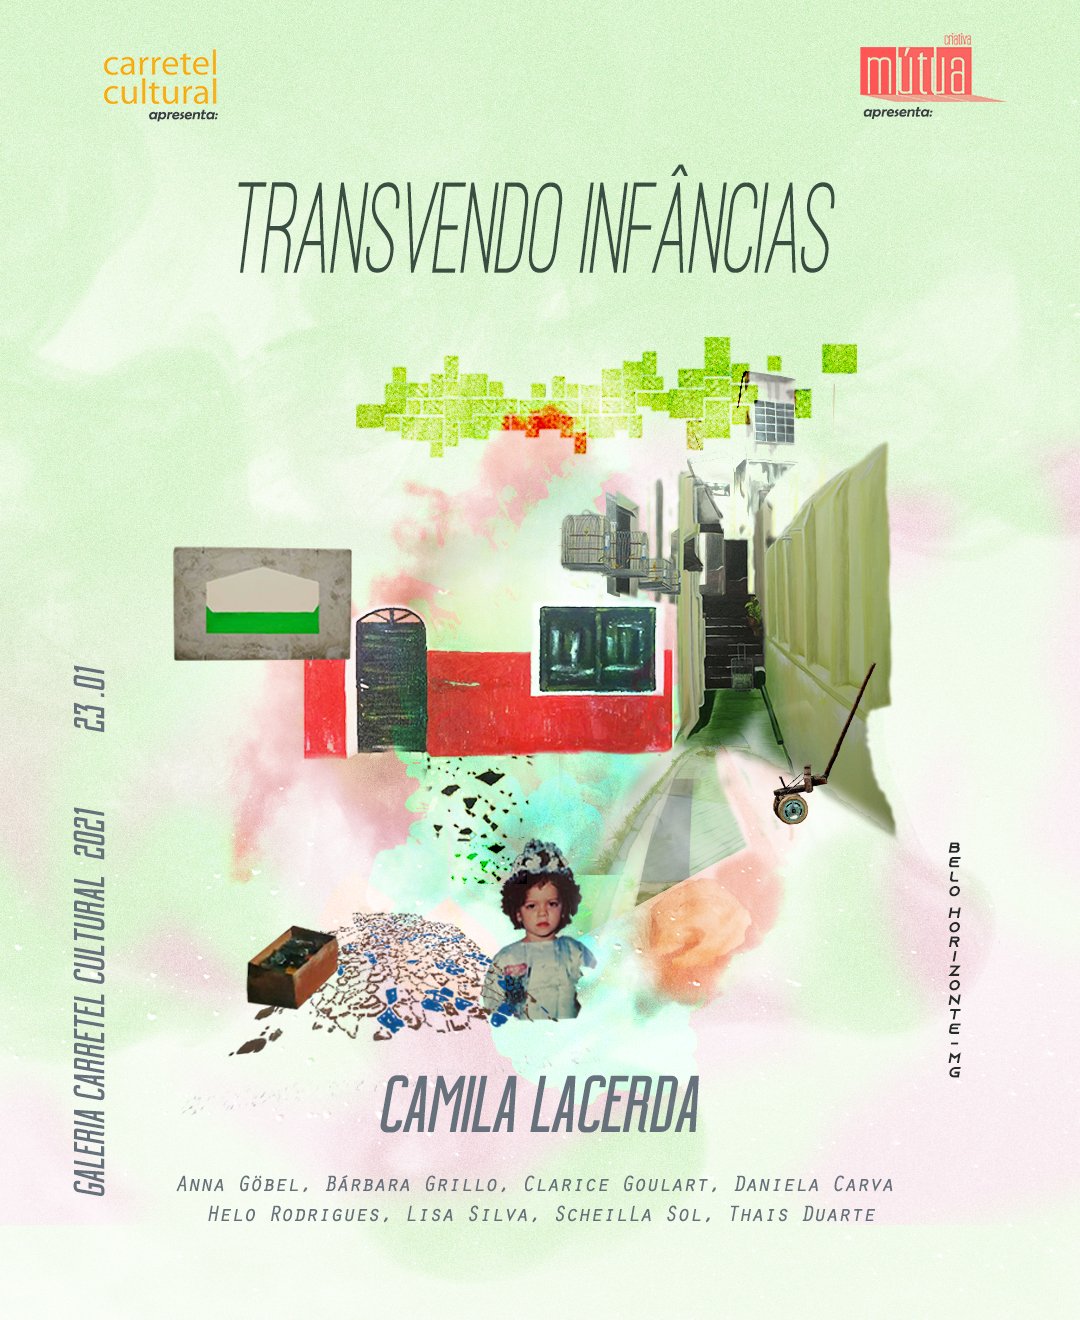 Camila Lacerda